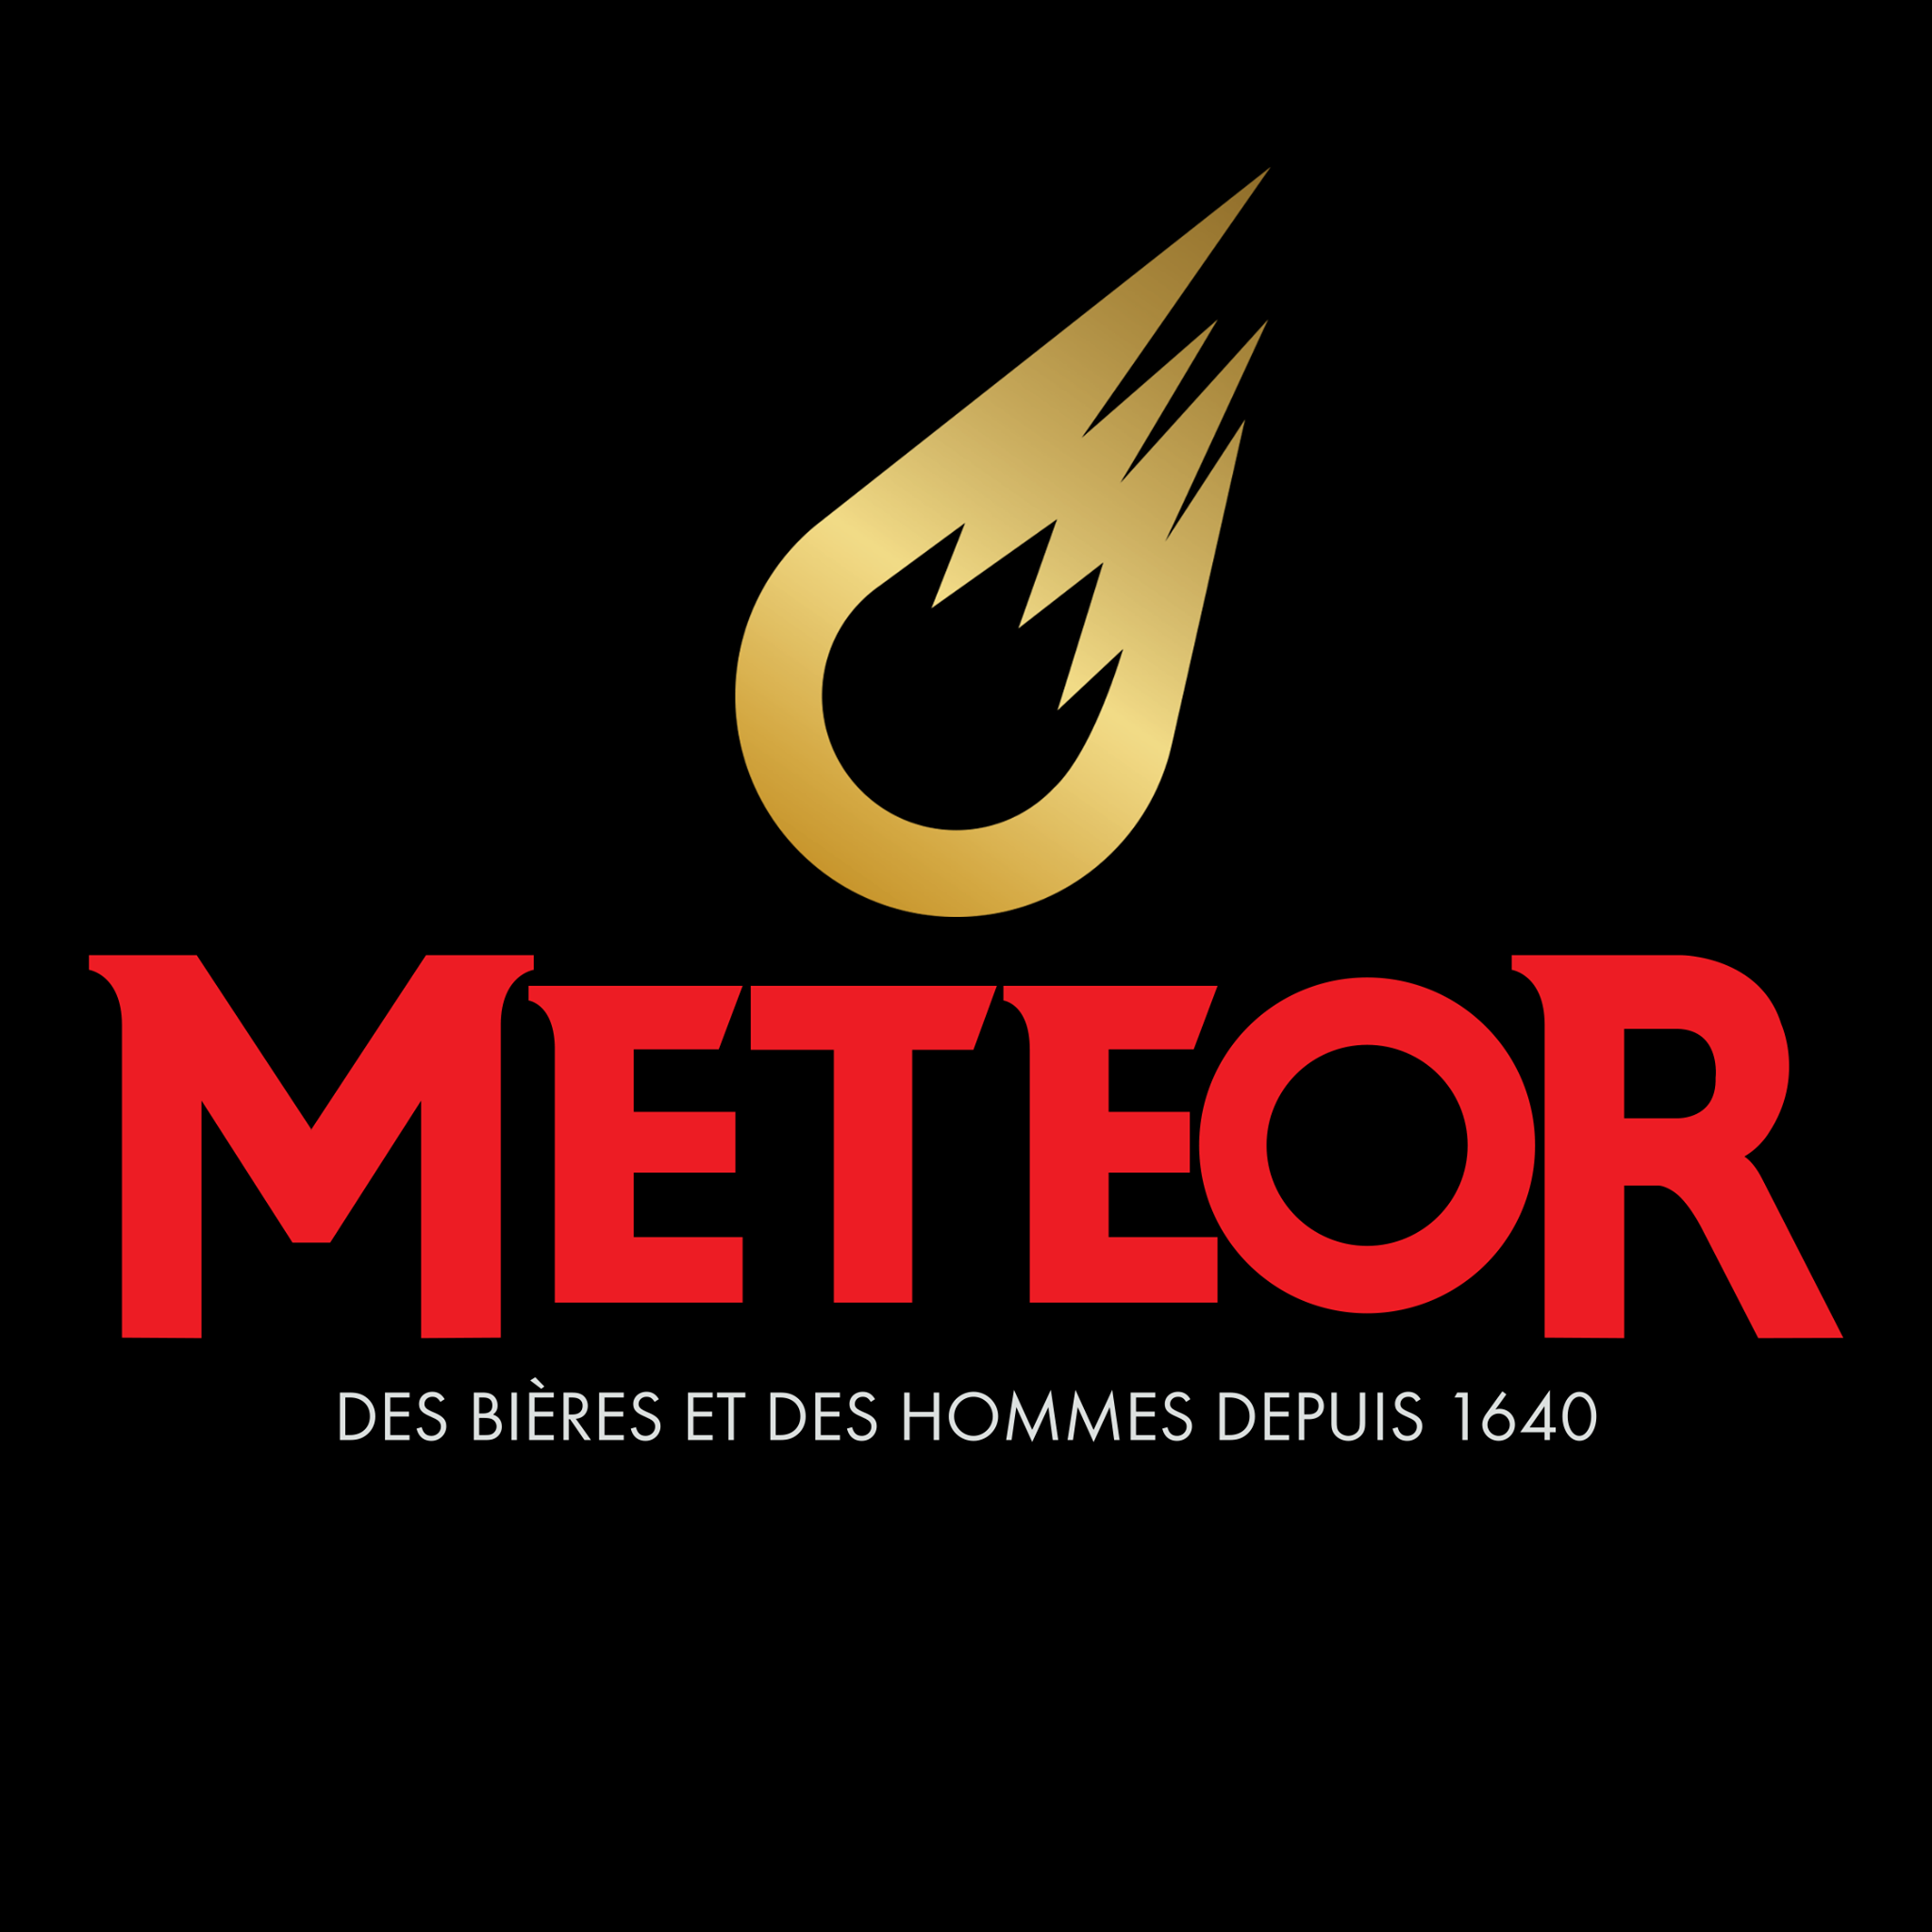 brasserie meteor street bouche festival 2020 - Street Bouche